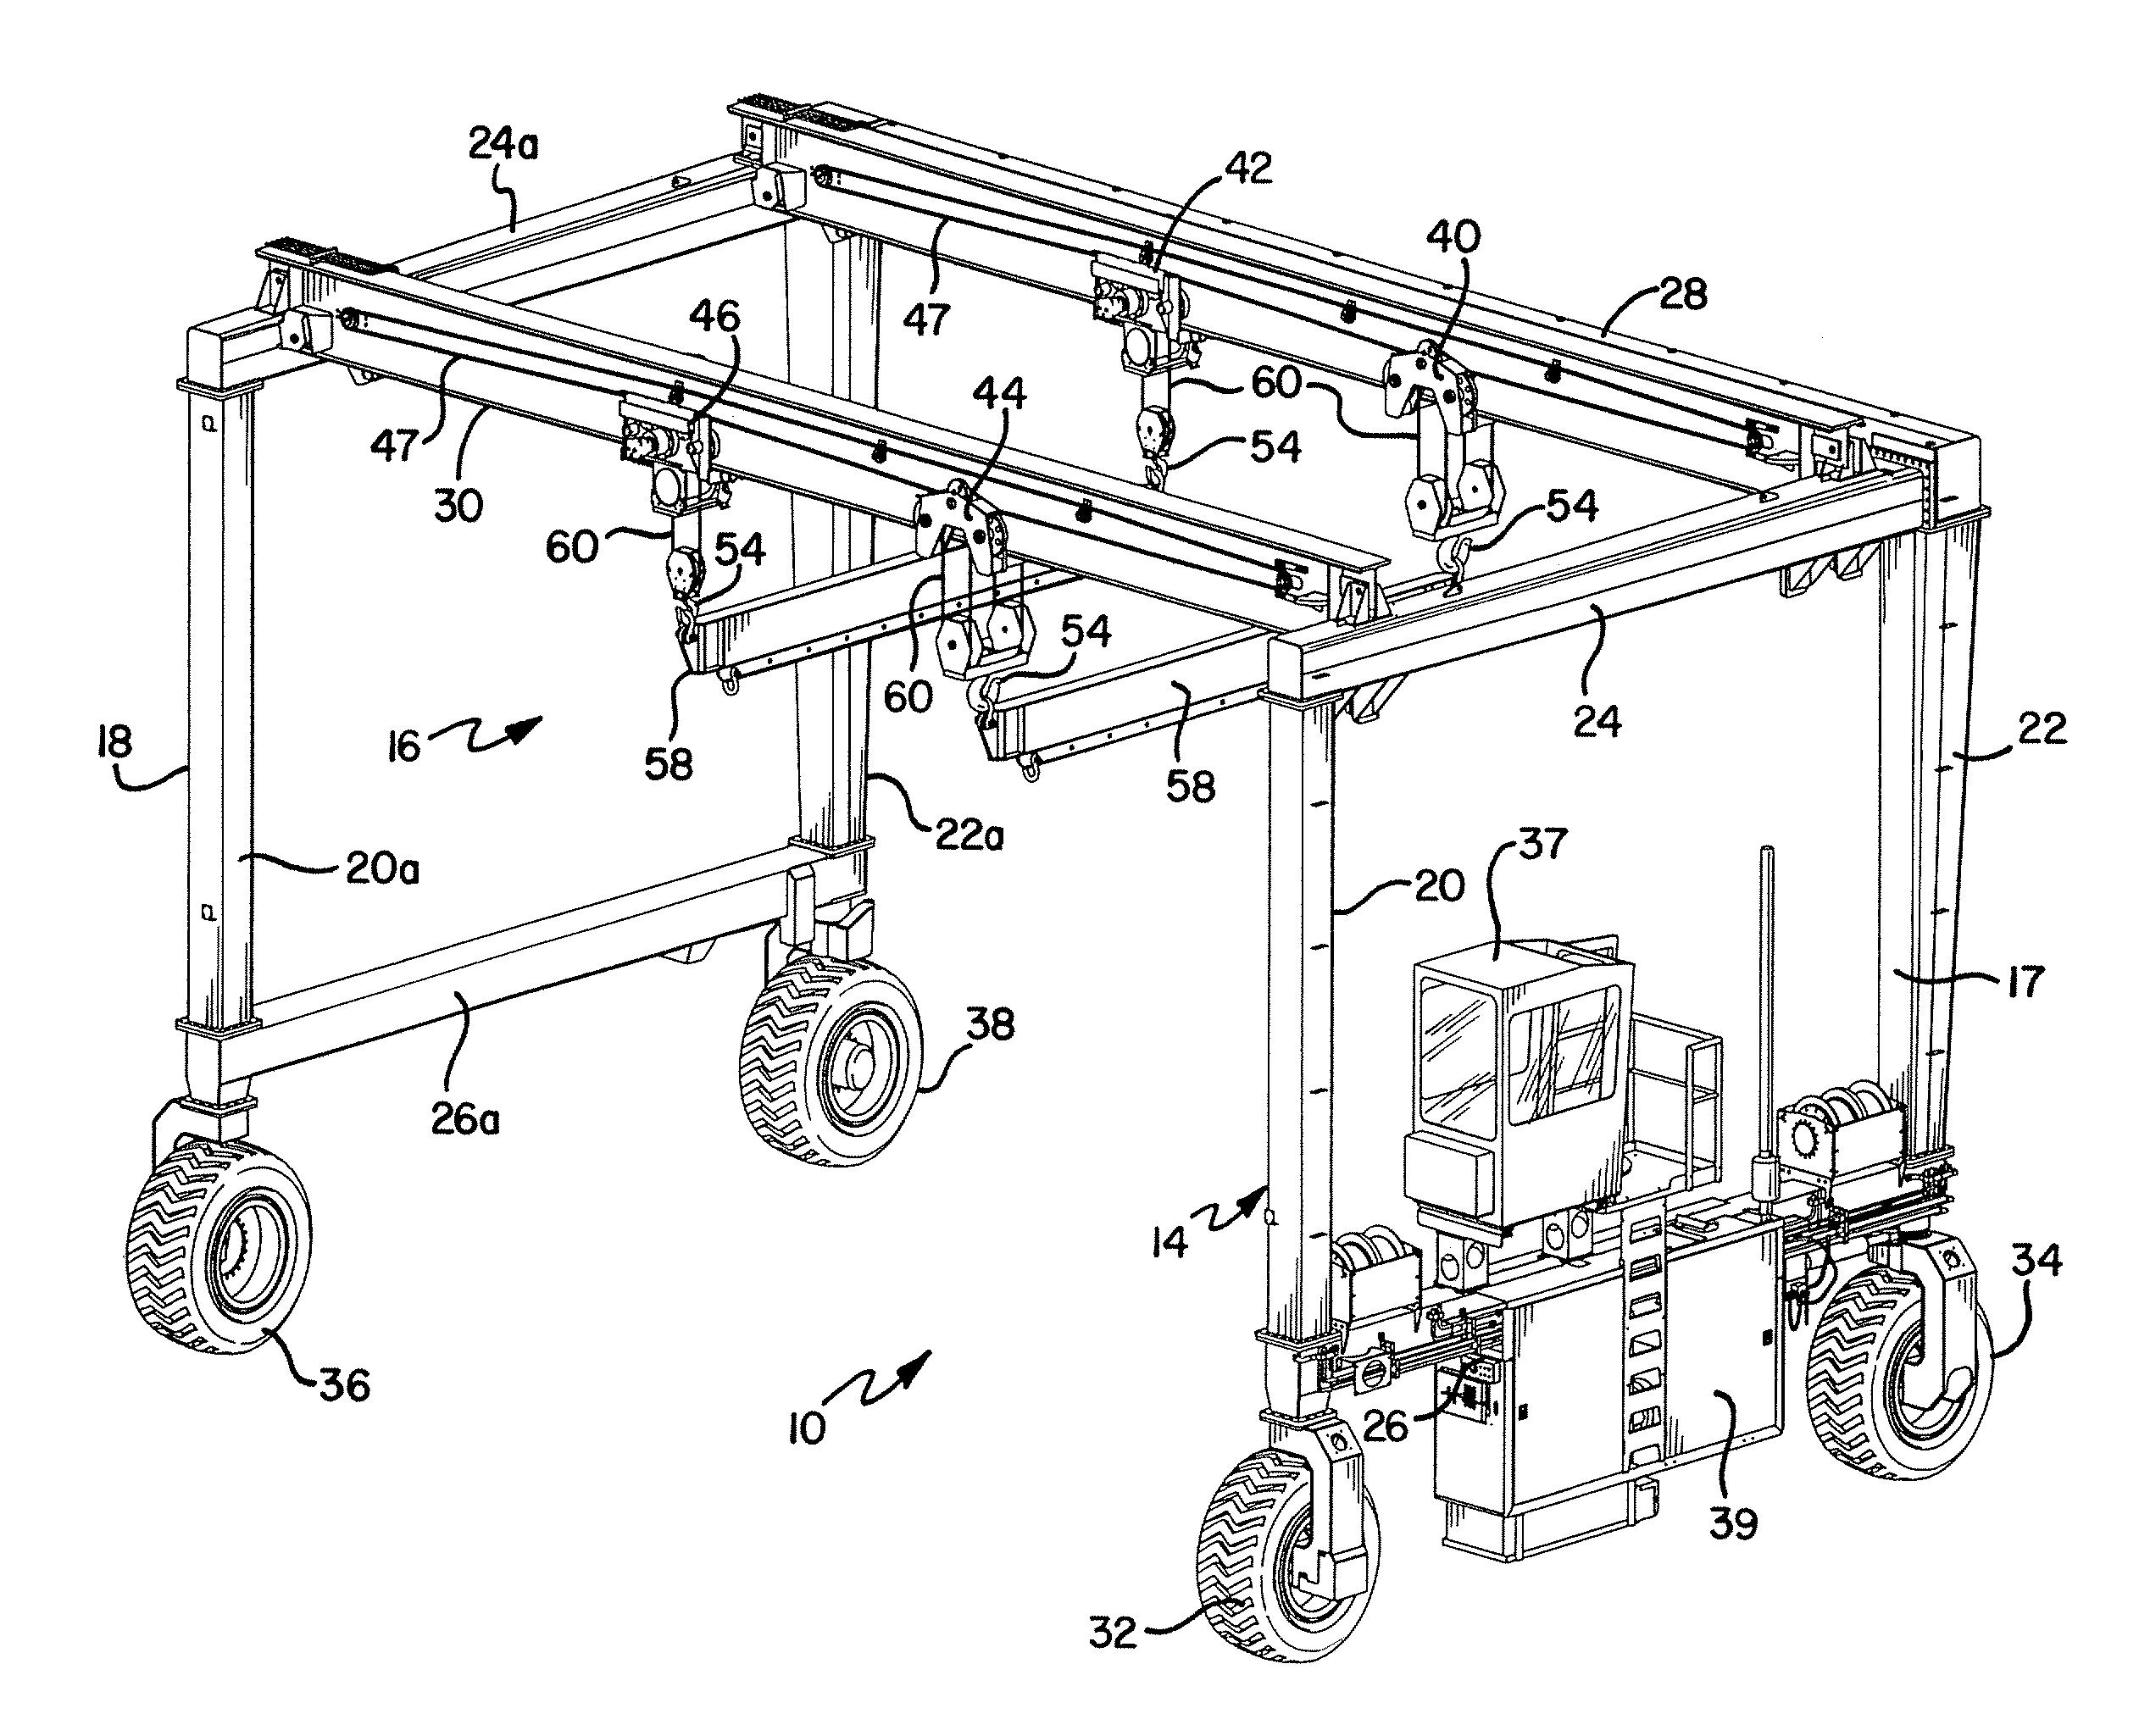 A Diagram For A Frame Hoist